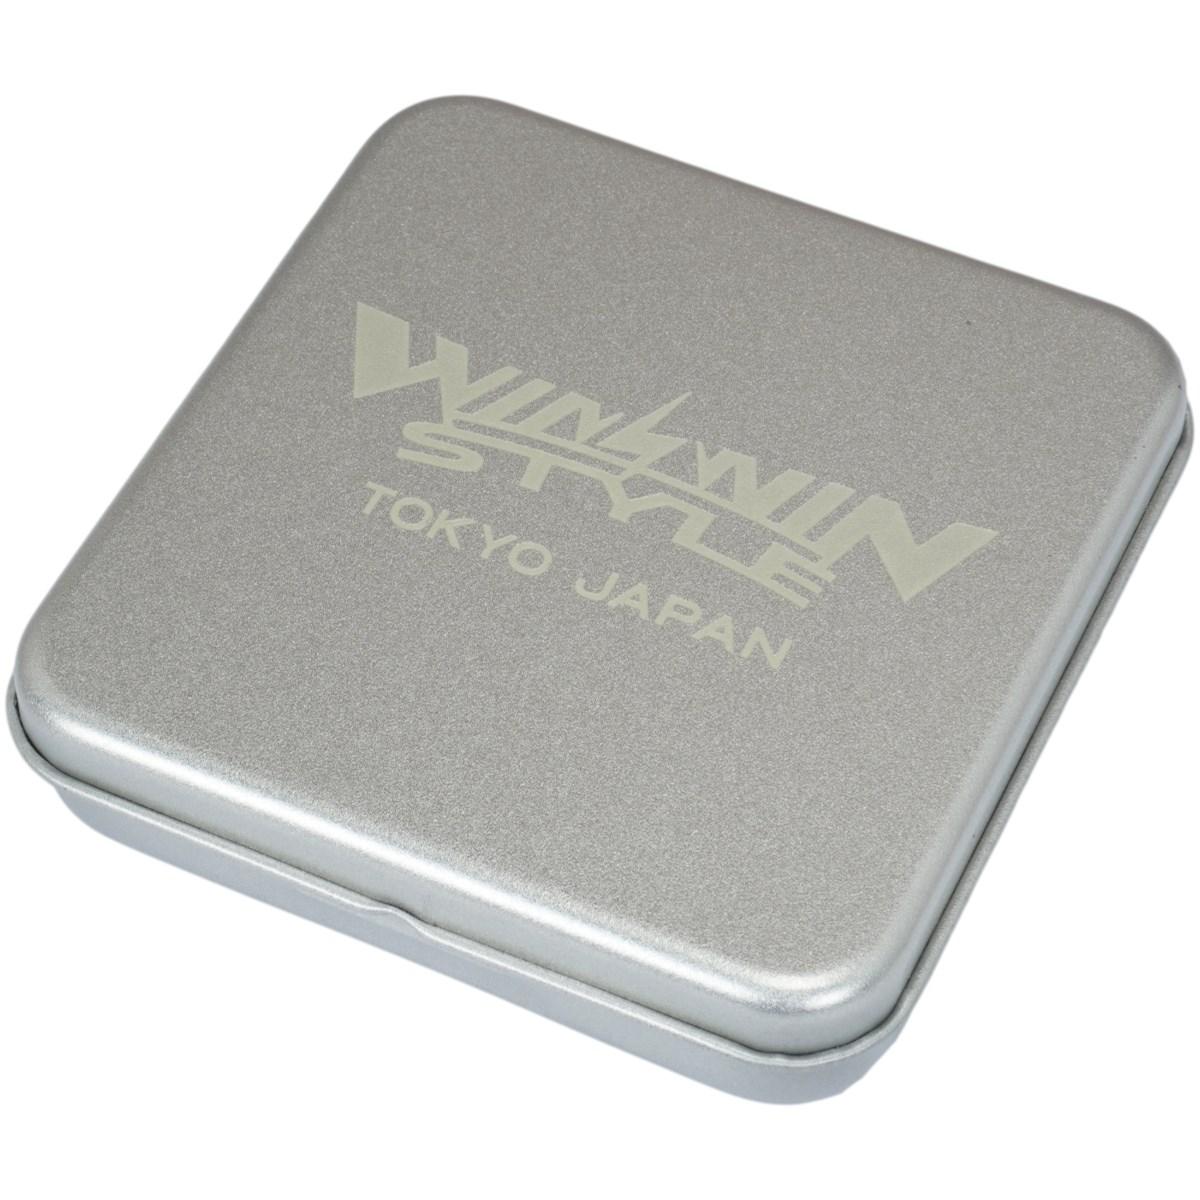 WINWIN STYLE マーカー用ギフト缶